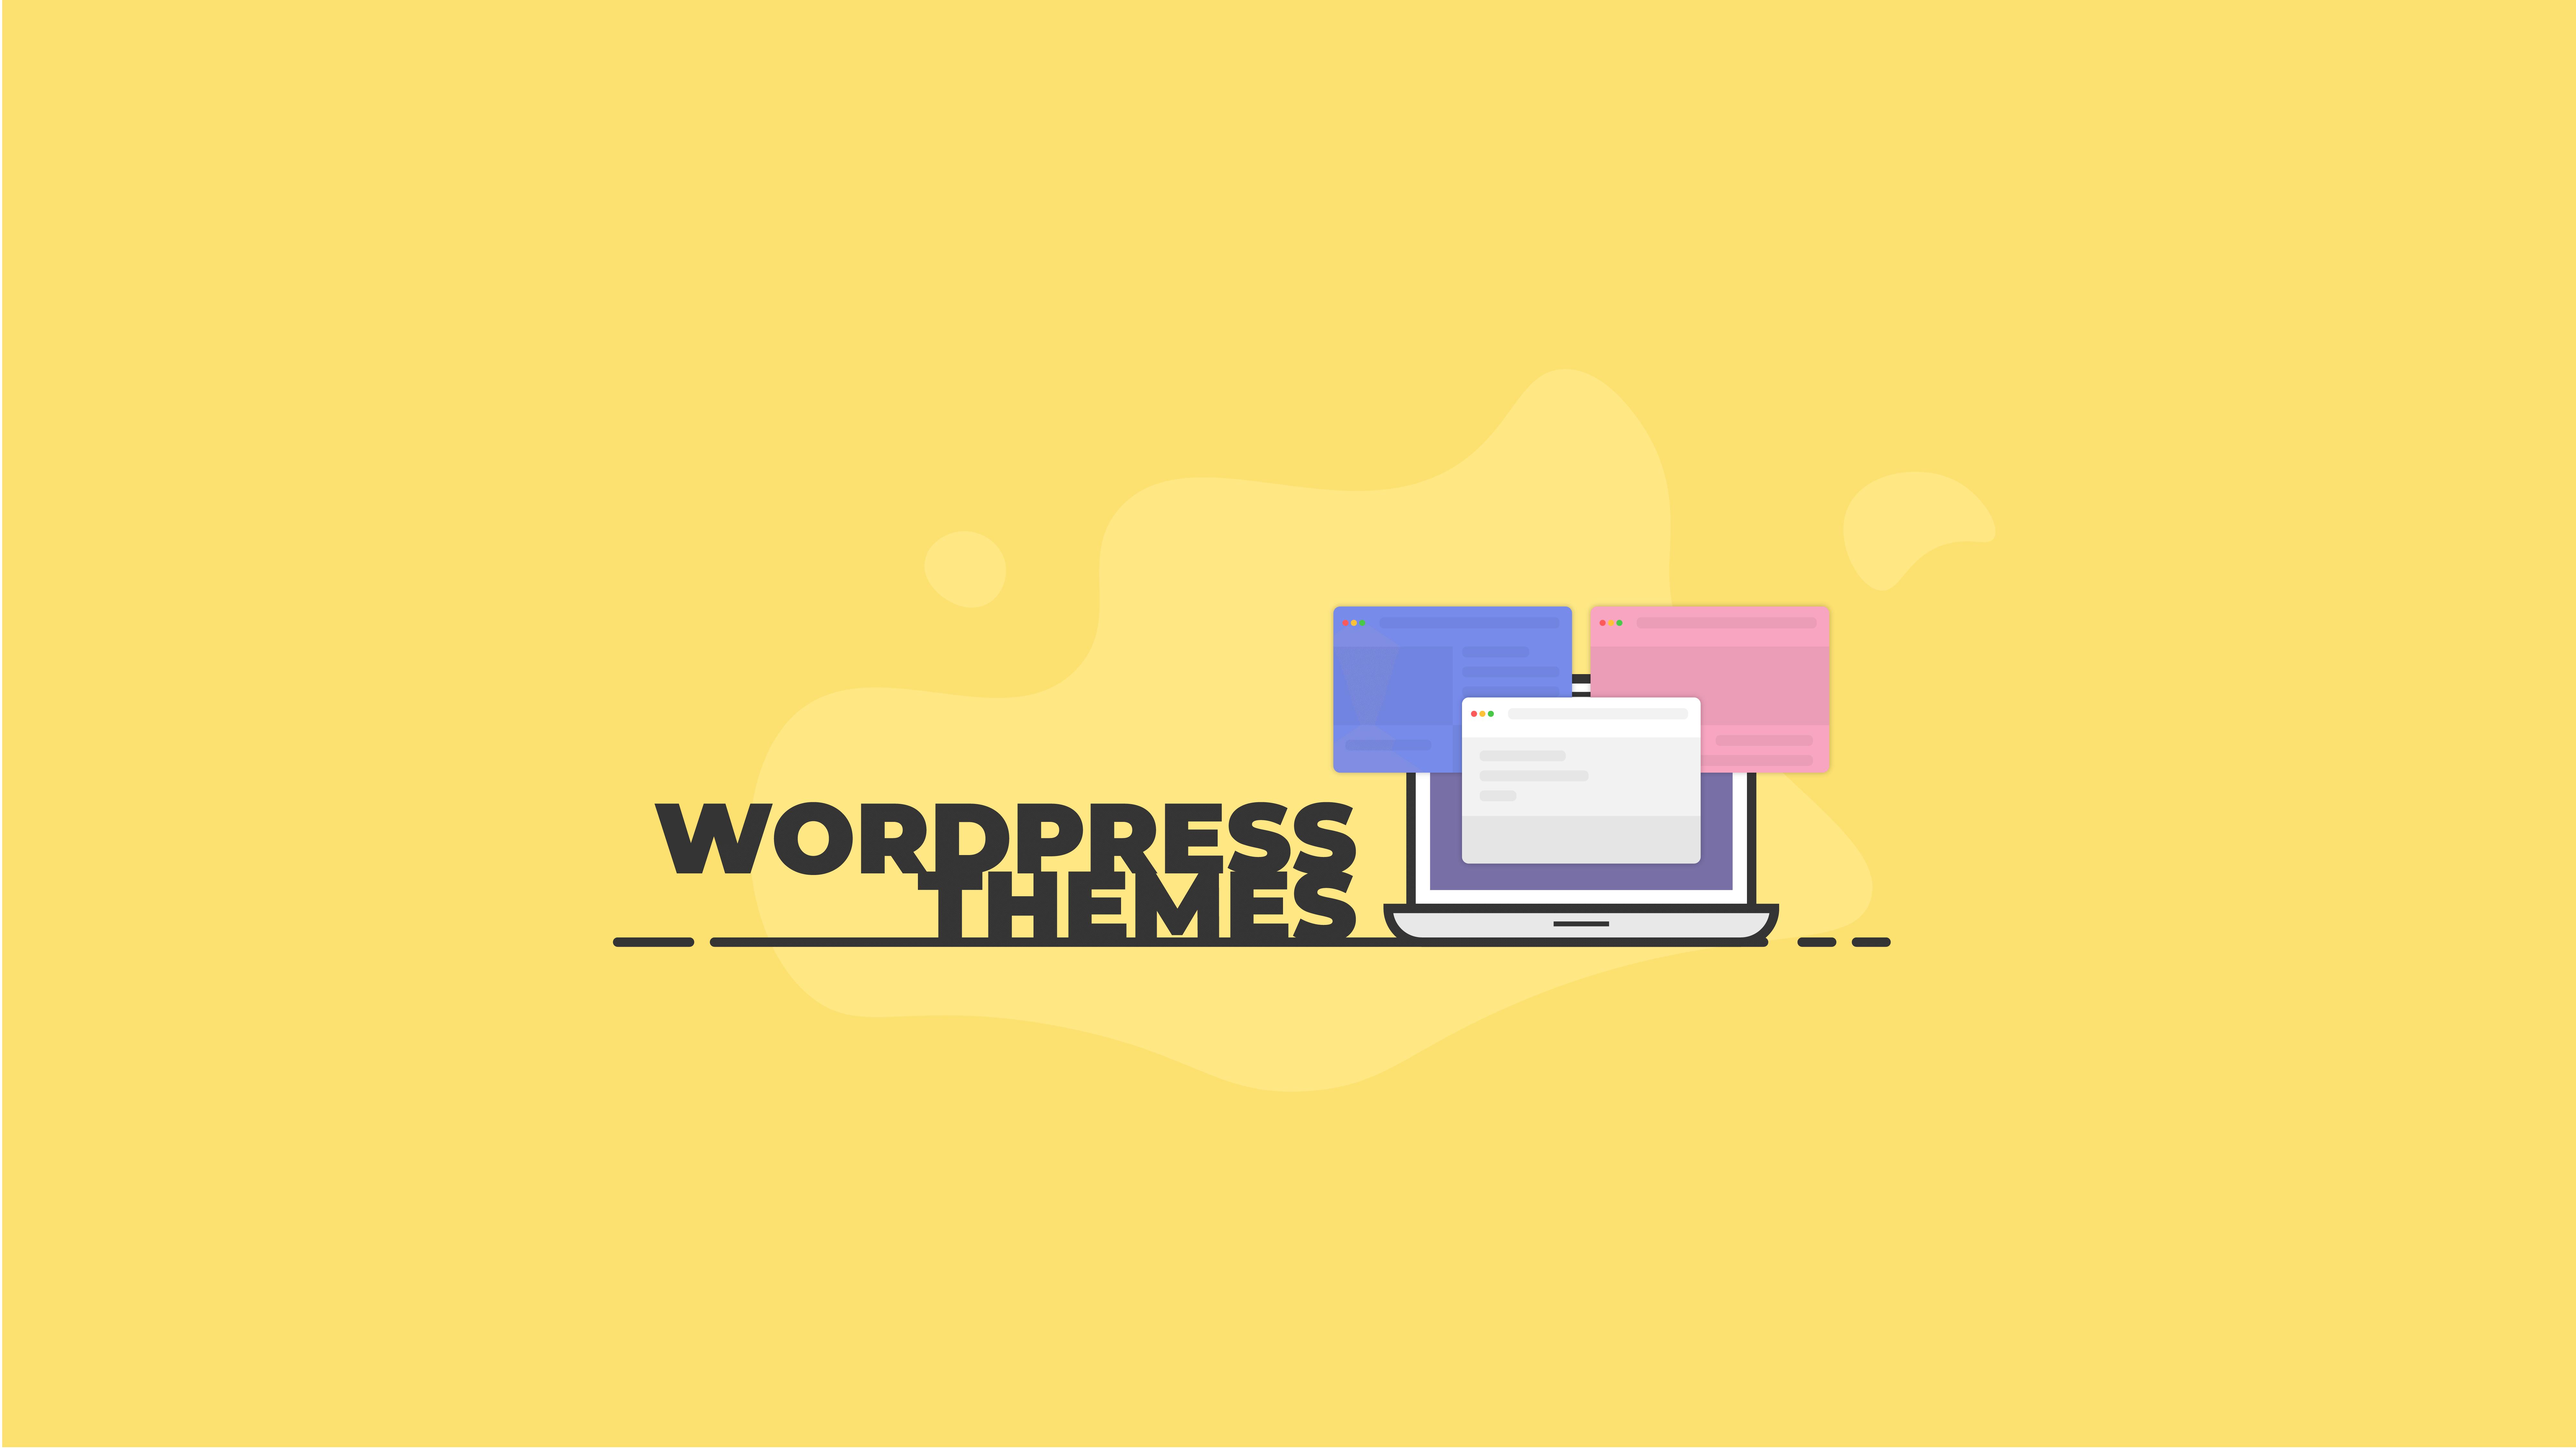 wordpress themes guide